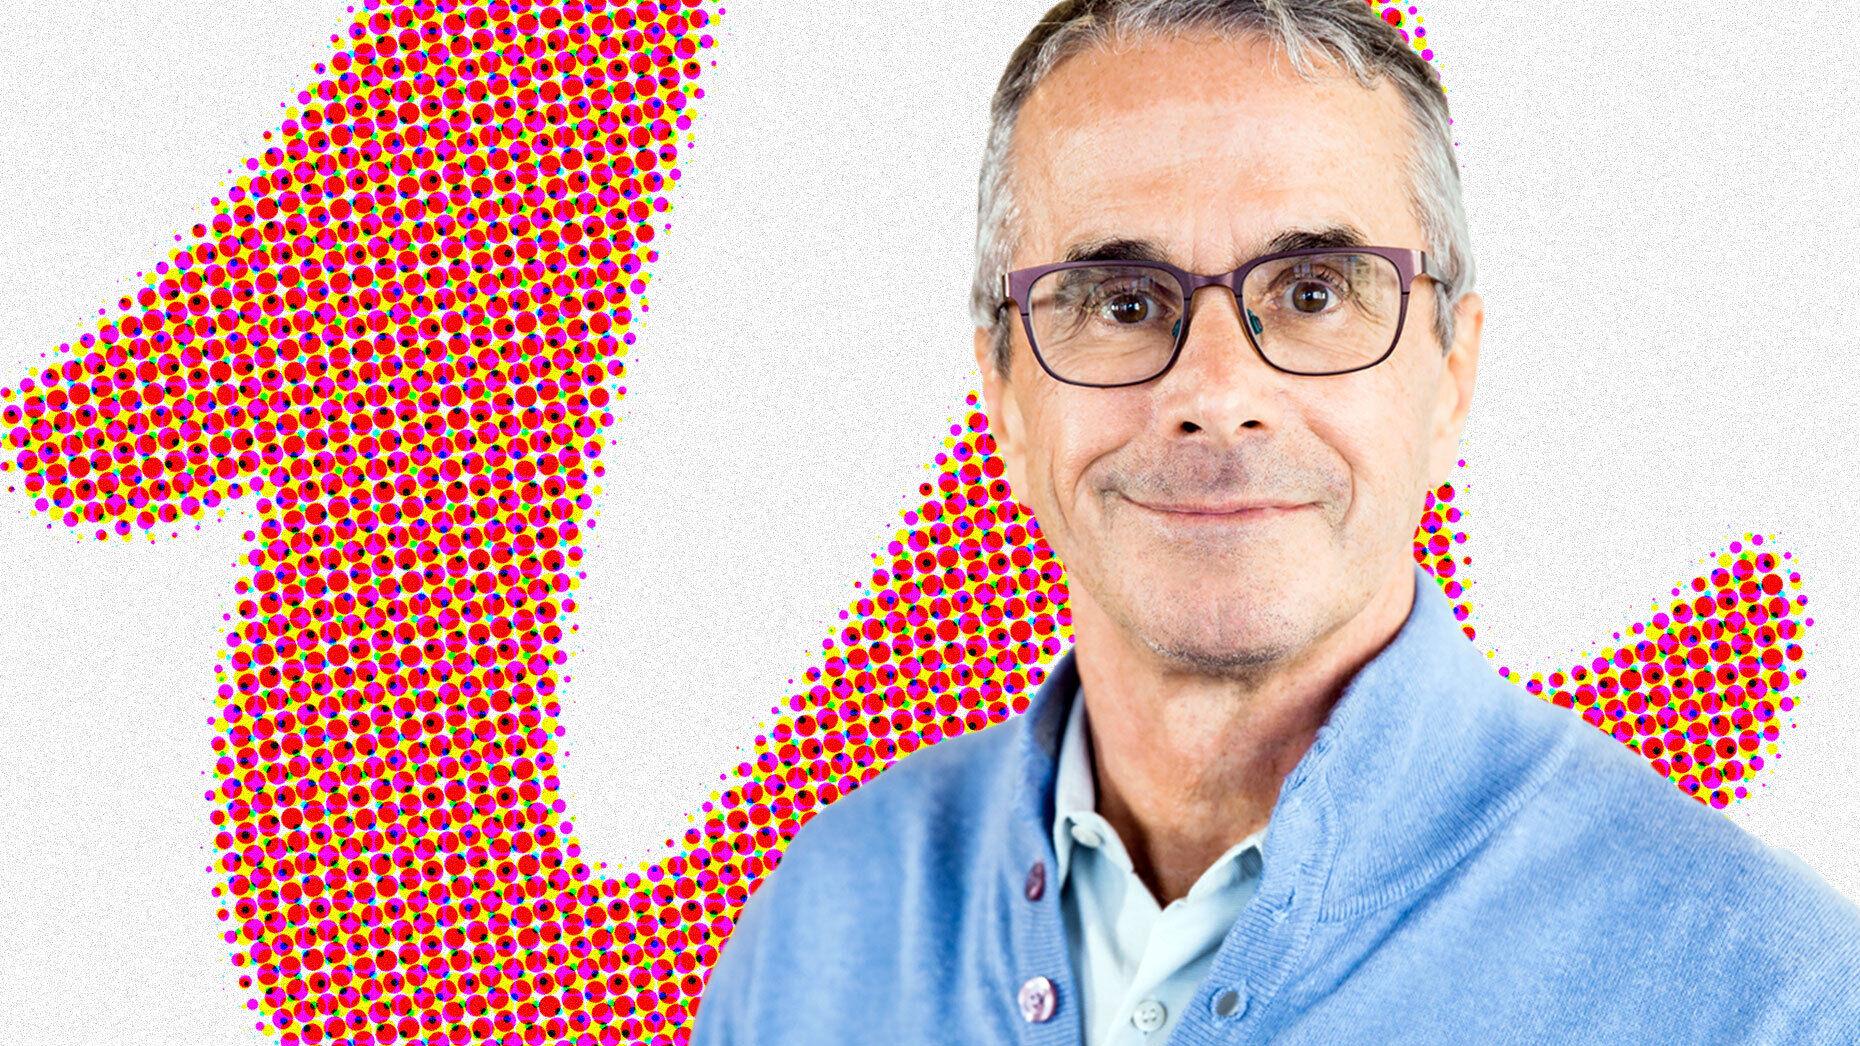 Udemy CEO Greg Coccari. Photo: Udemy